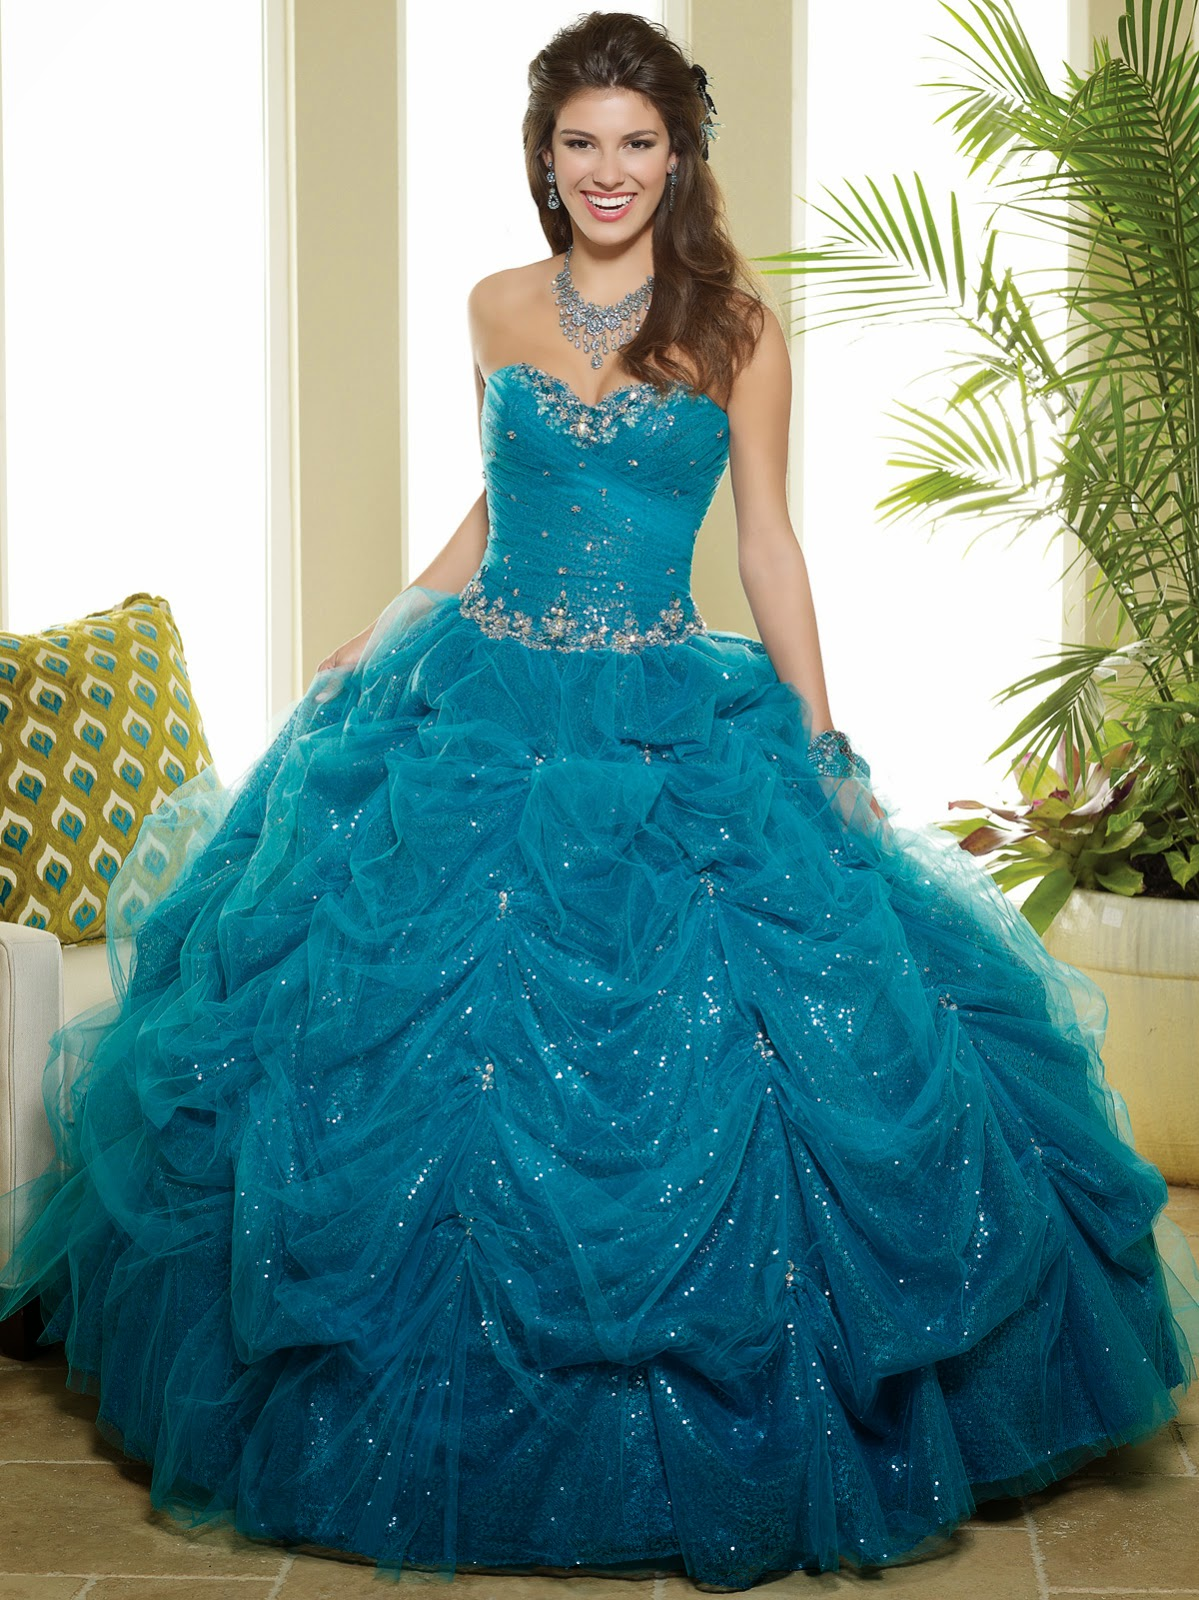 Vistoso 15 Vestidos De Fiesta Ornamento - Ideas de Estilos de ...